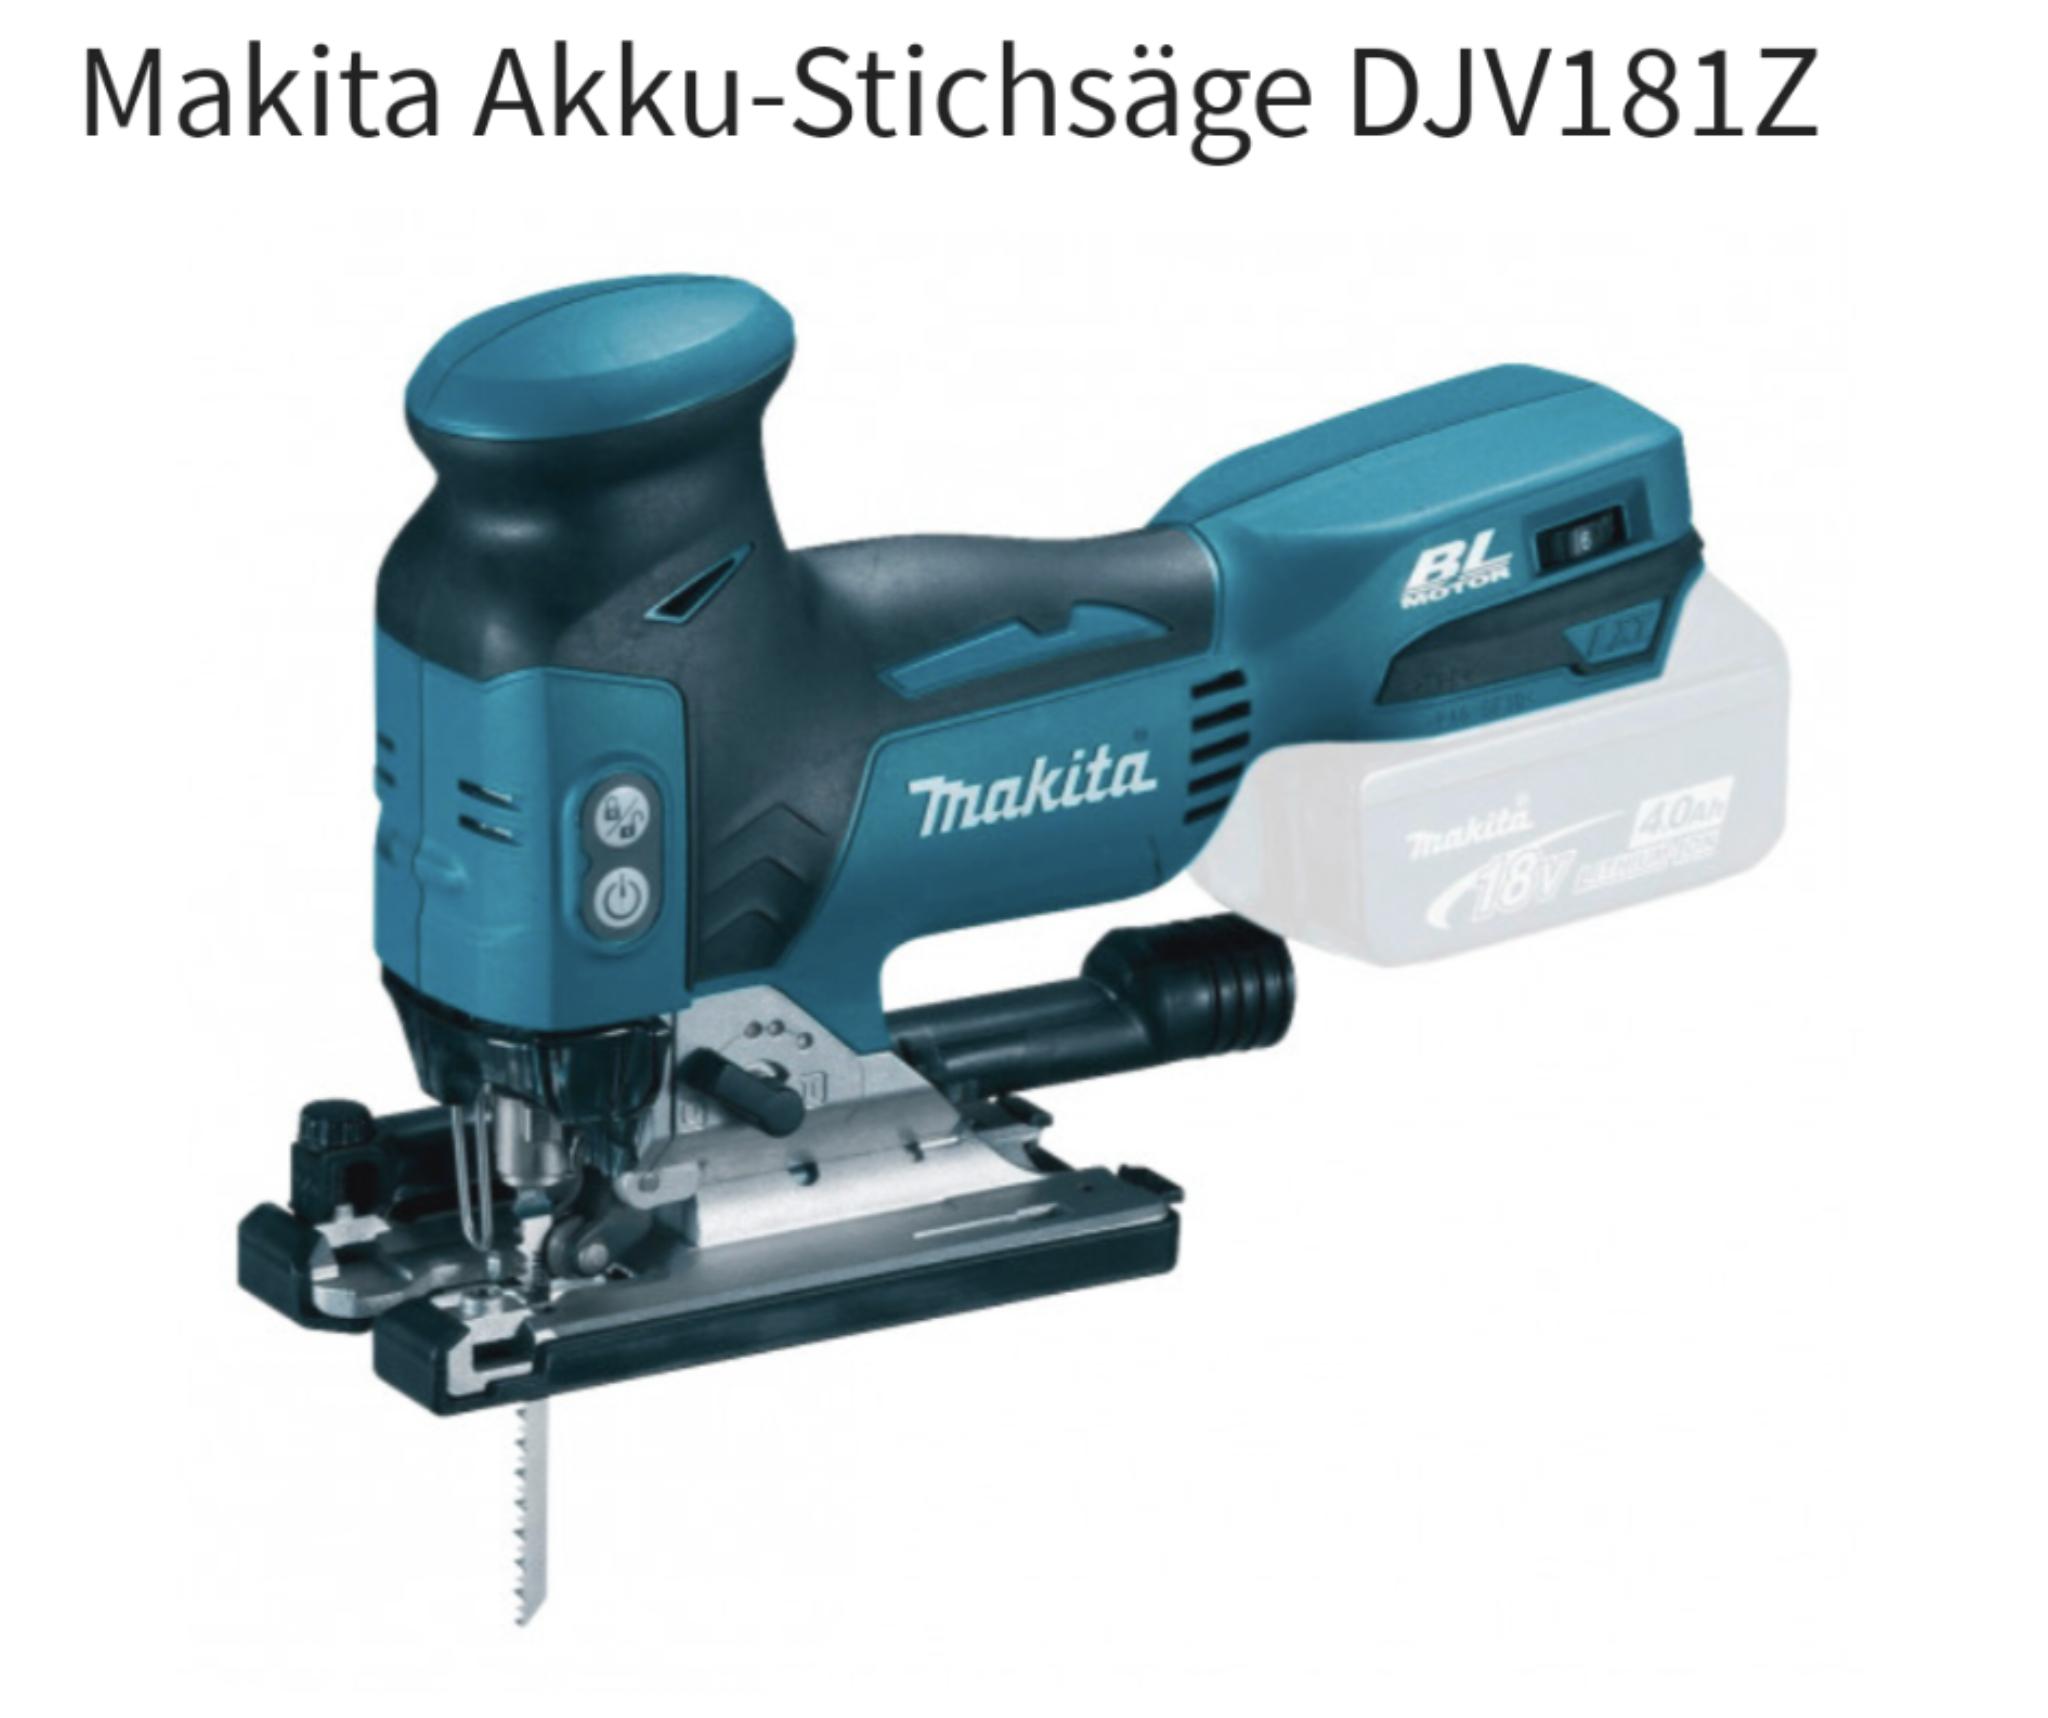 Makita Akku-Stichsäge DJV181Z